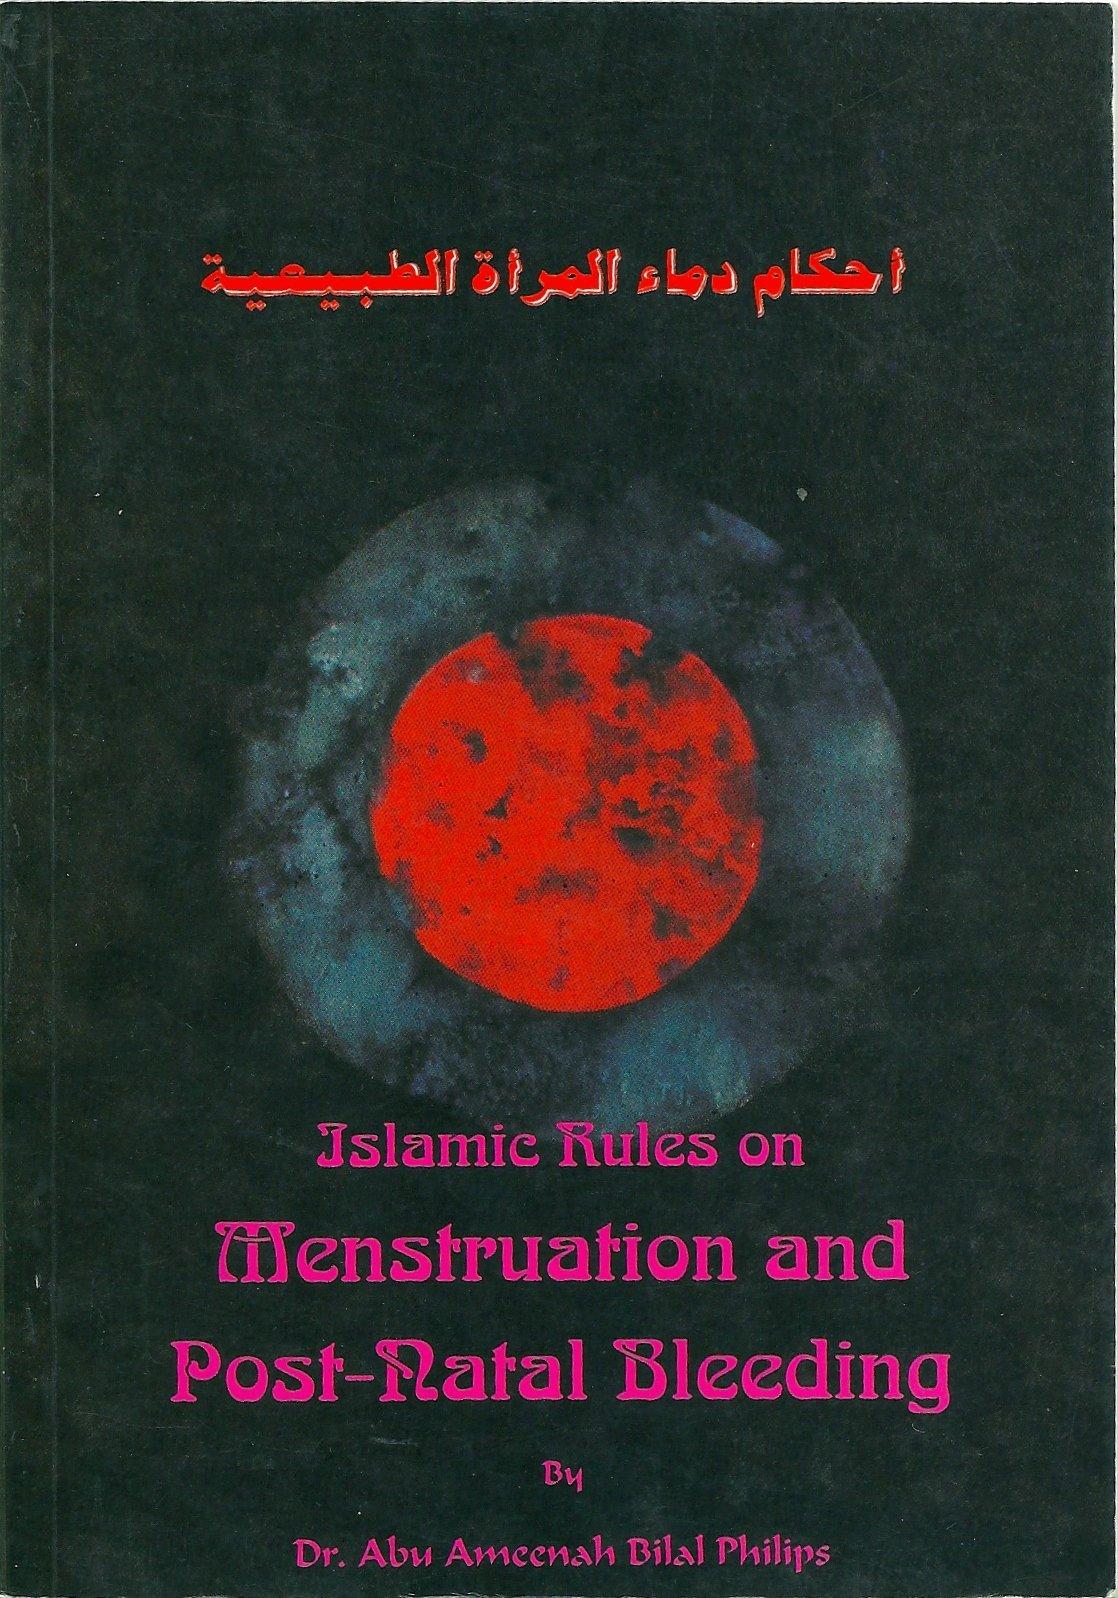 Islamic Rules on Menstruation and Post-natal Bleeding: DR